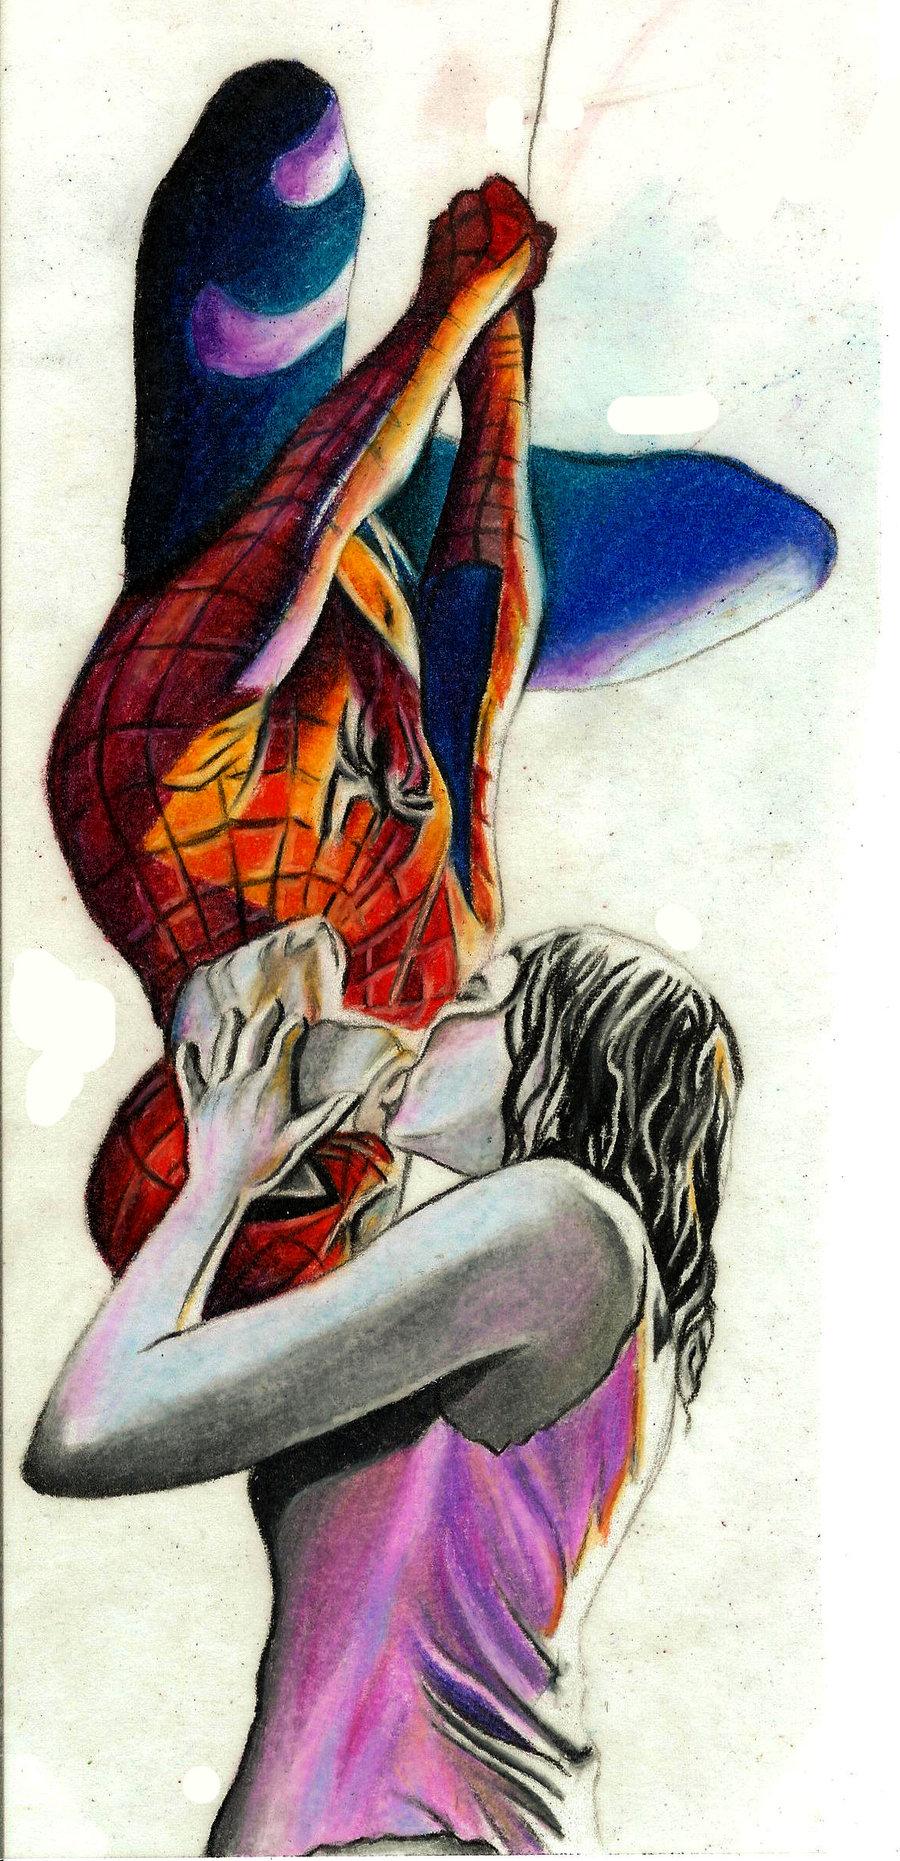 Drawn rain vector background By blondecrsity Spiderman blondecrsity blondecrsity